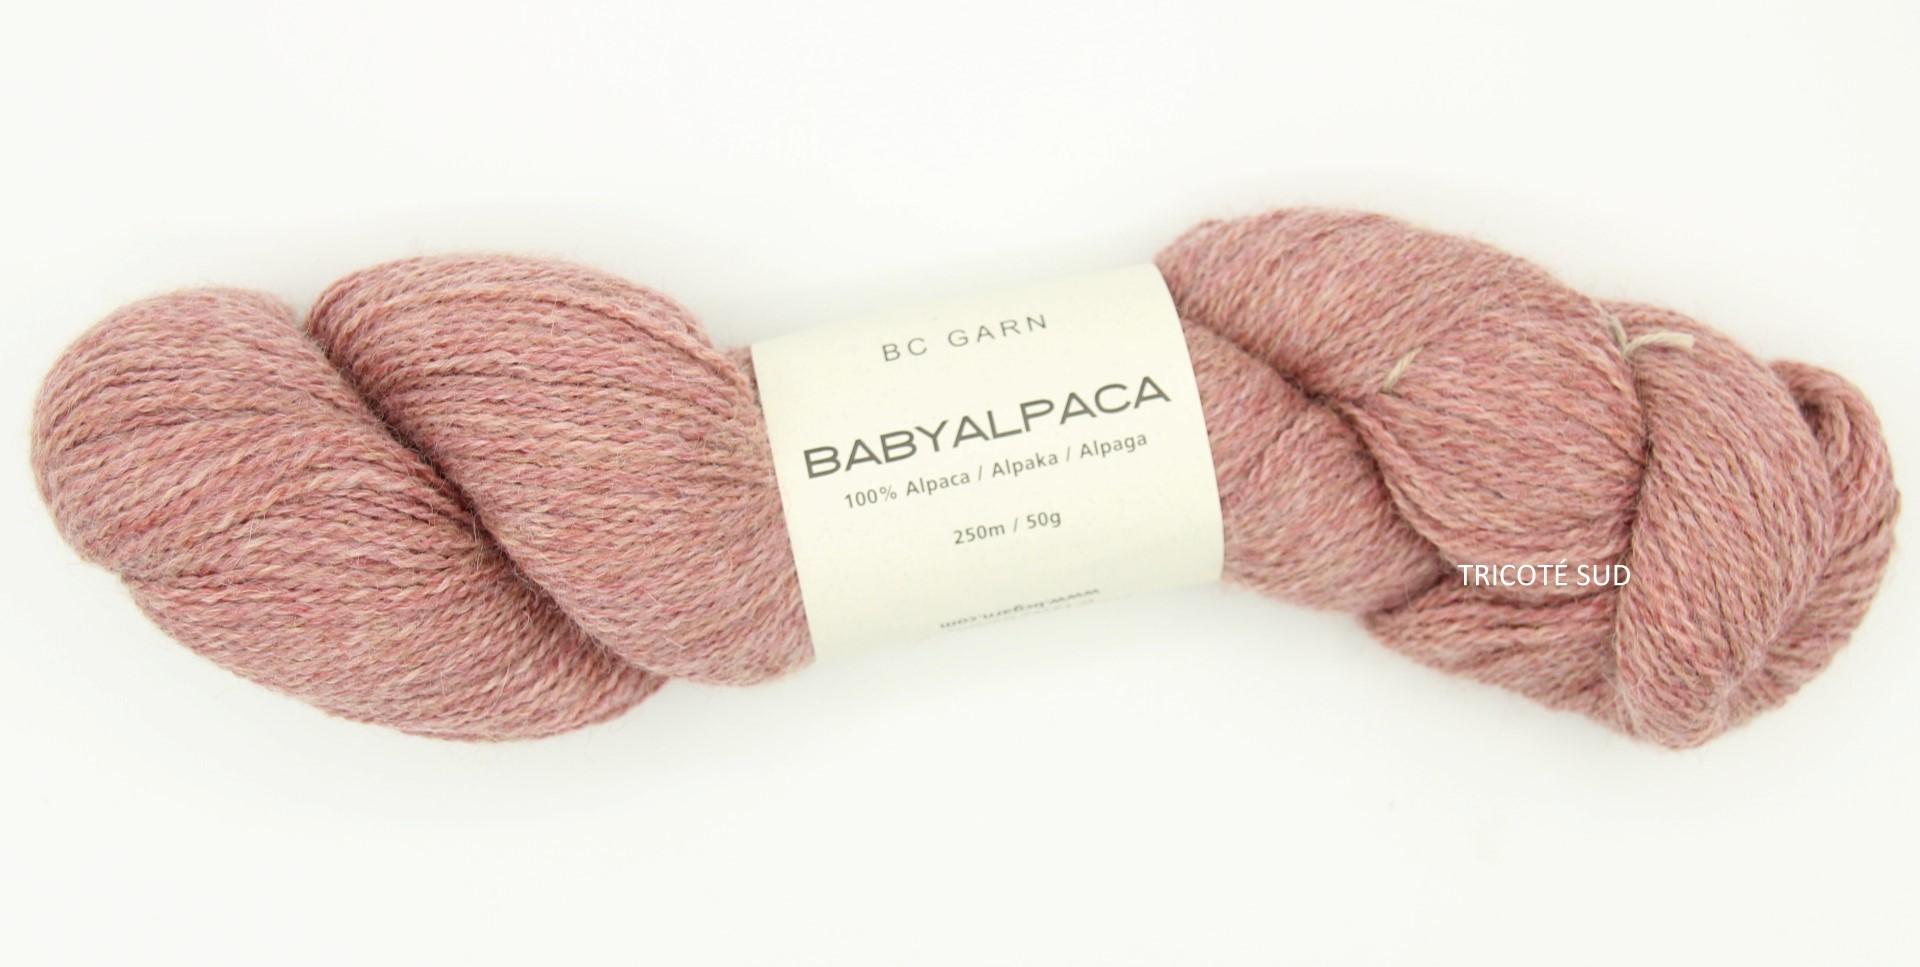 BABY ALPACA BC GARN COLORIS 127 (Large)